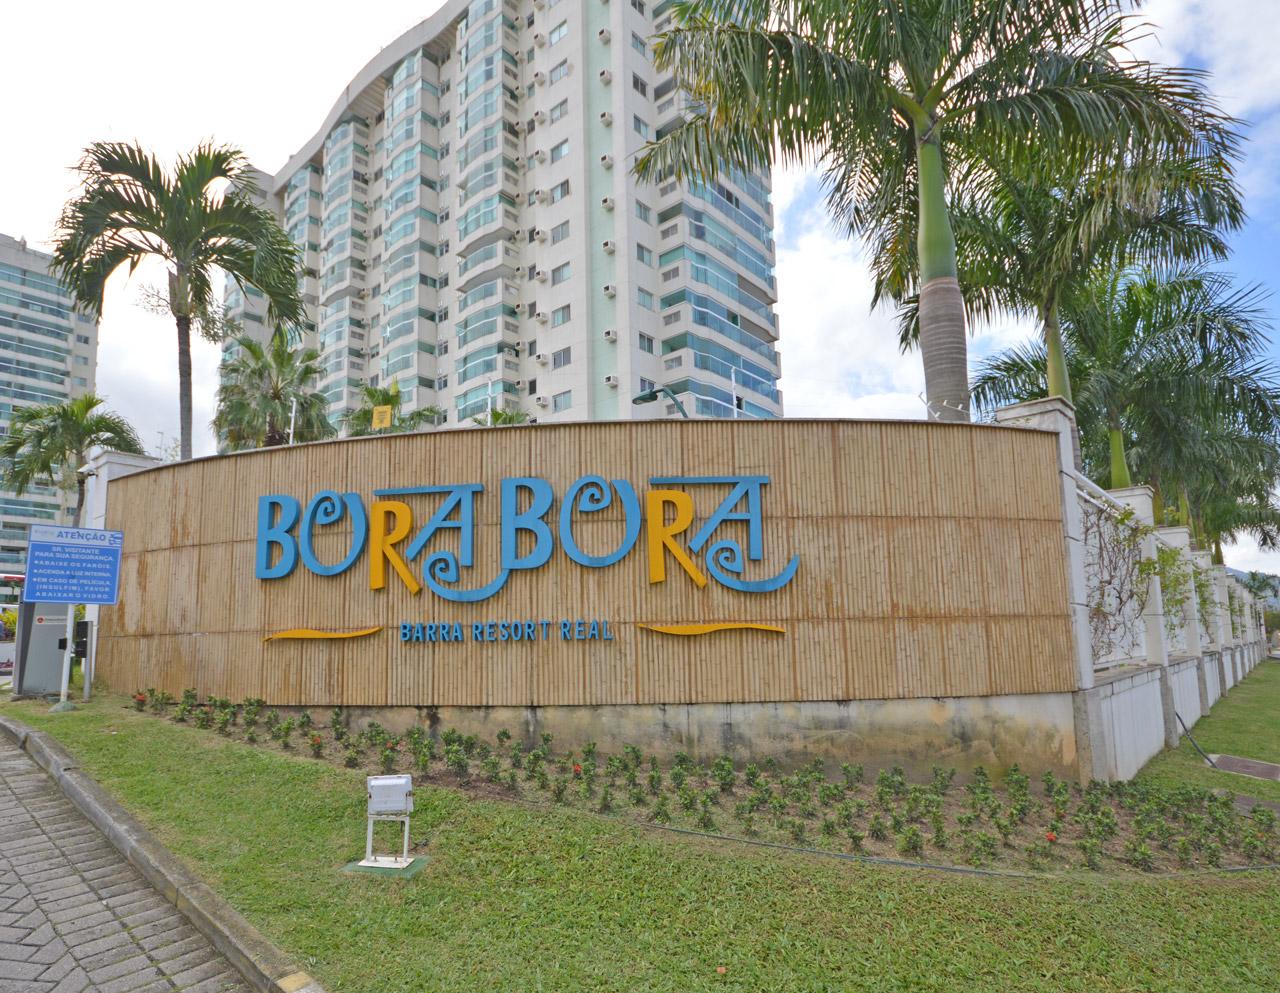 Bora Bora Resort Real